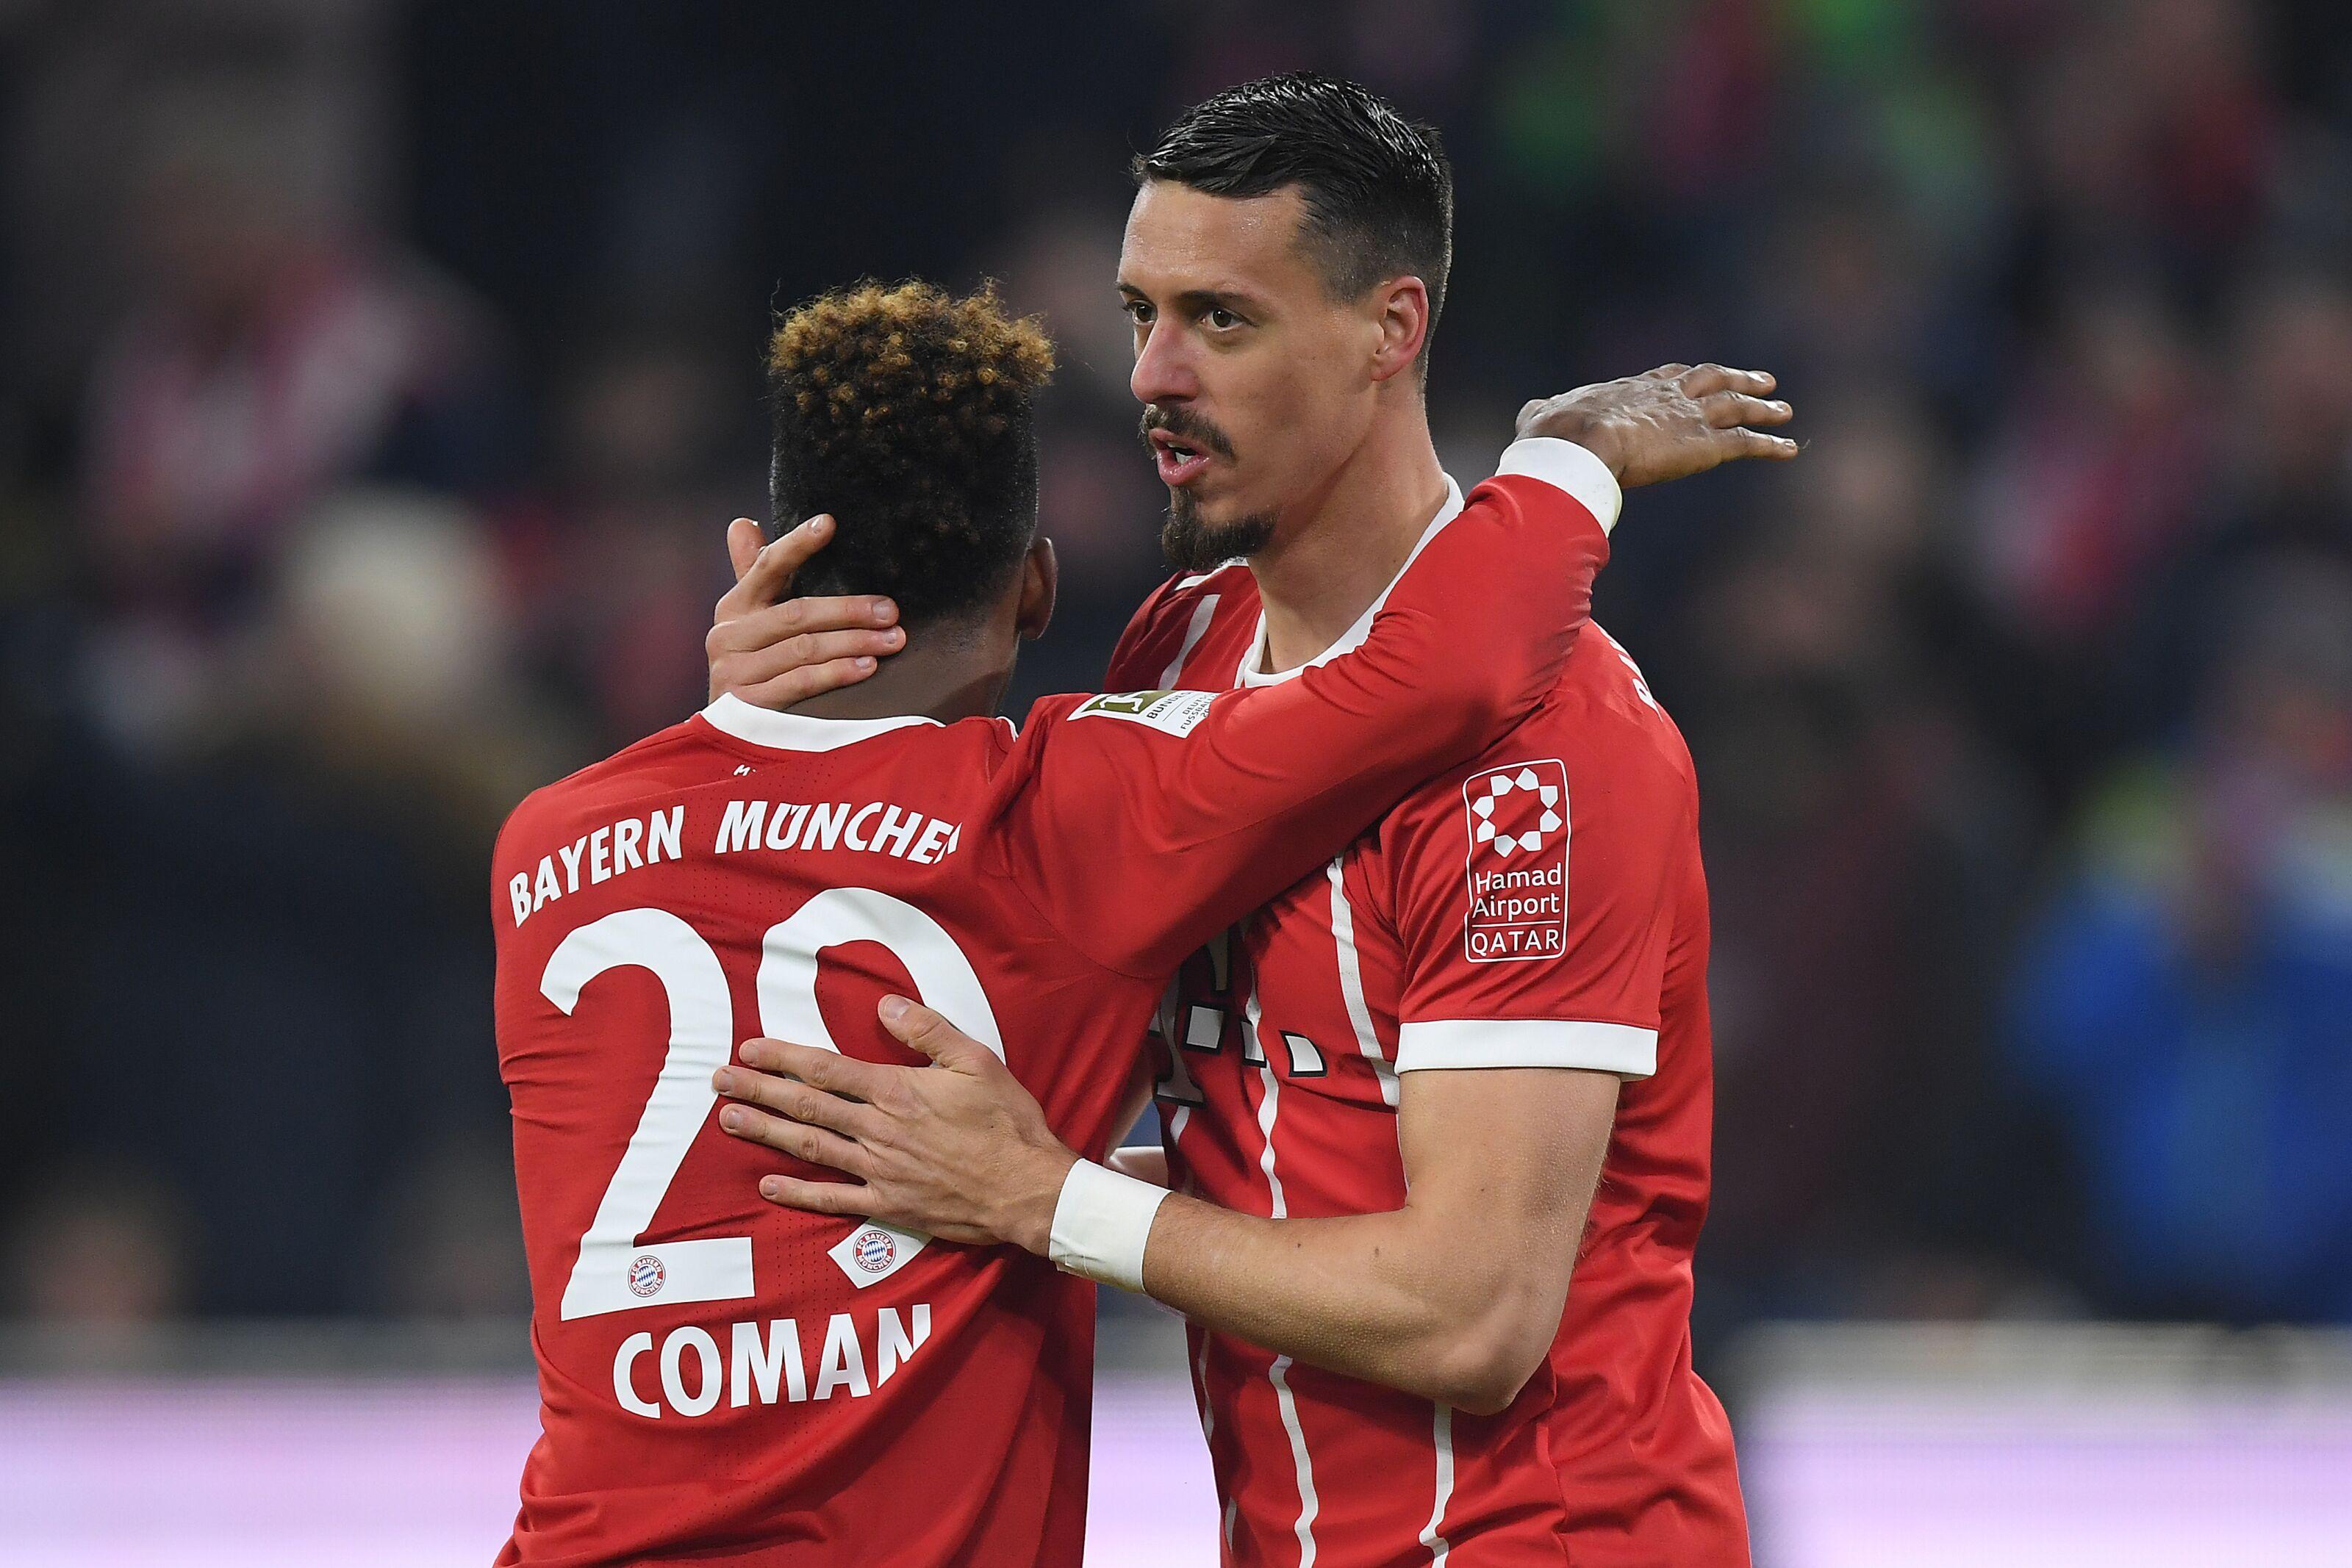 Bayern Munich striker Sandro Wagner linked with Galatasaray